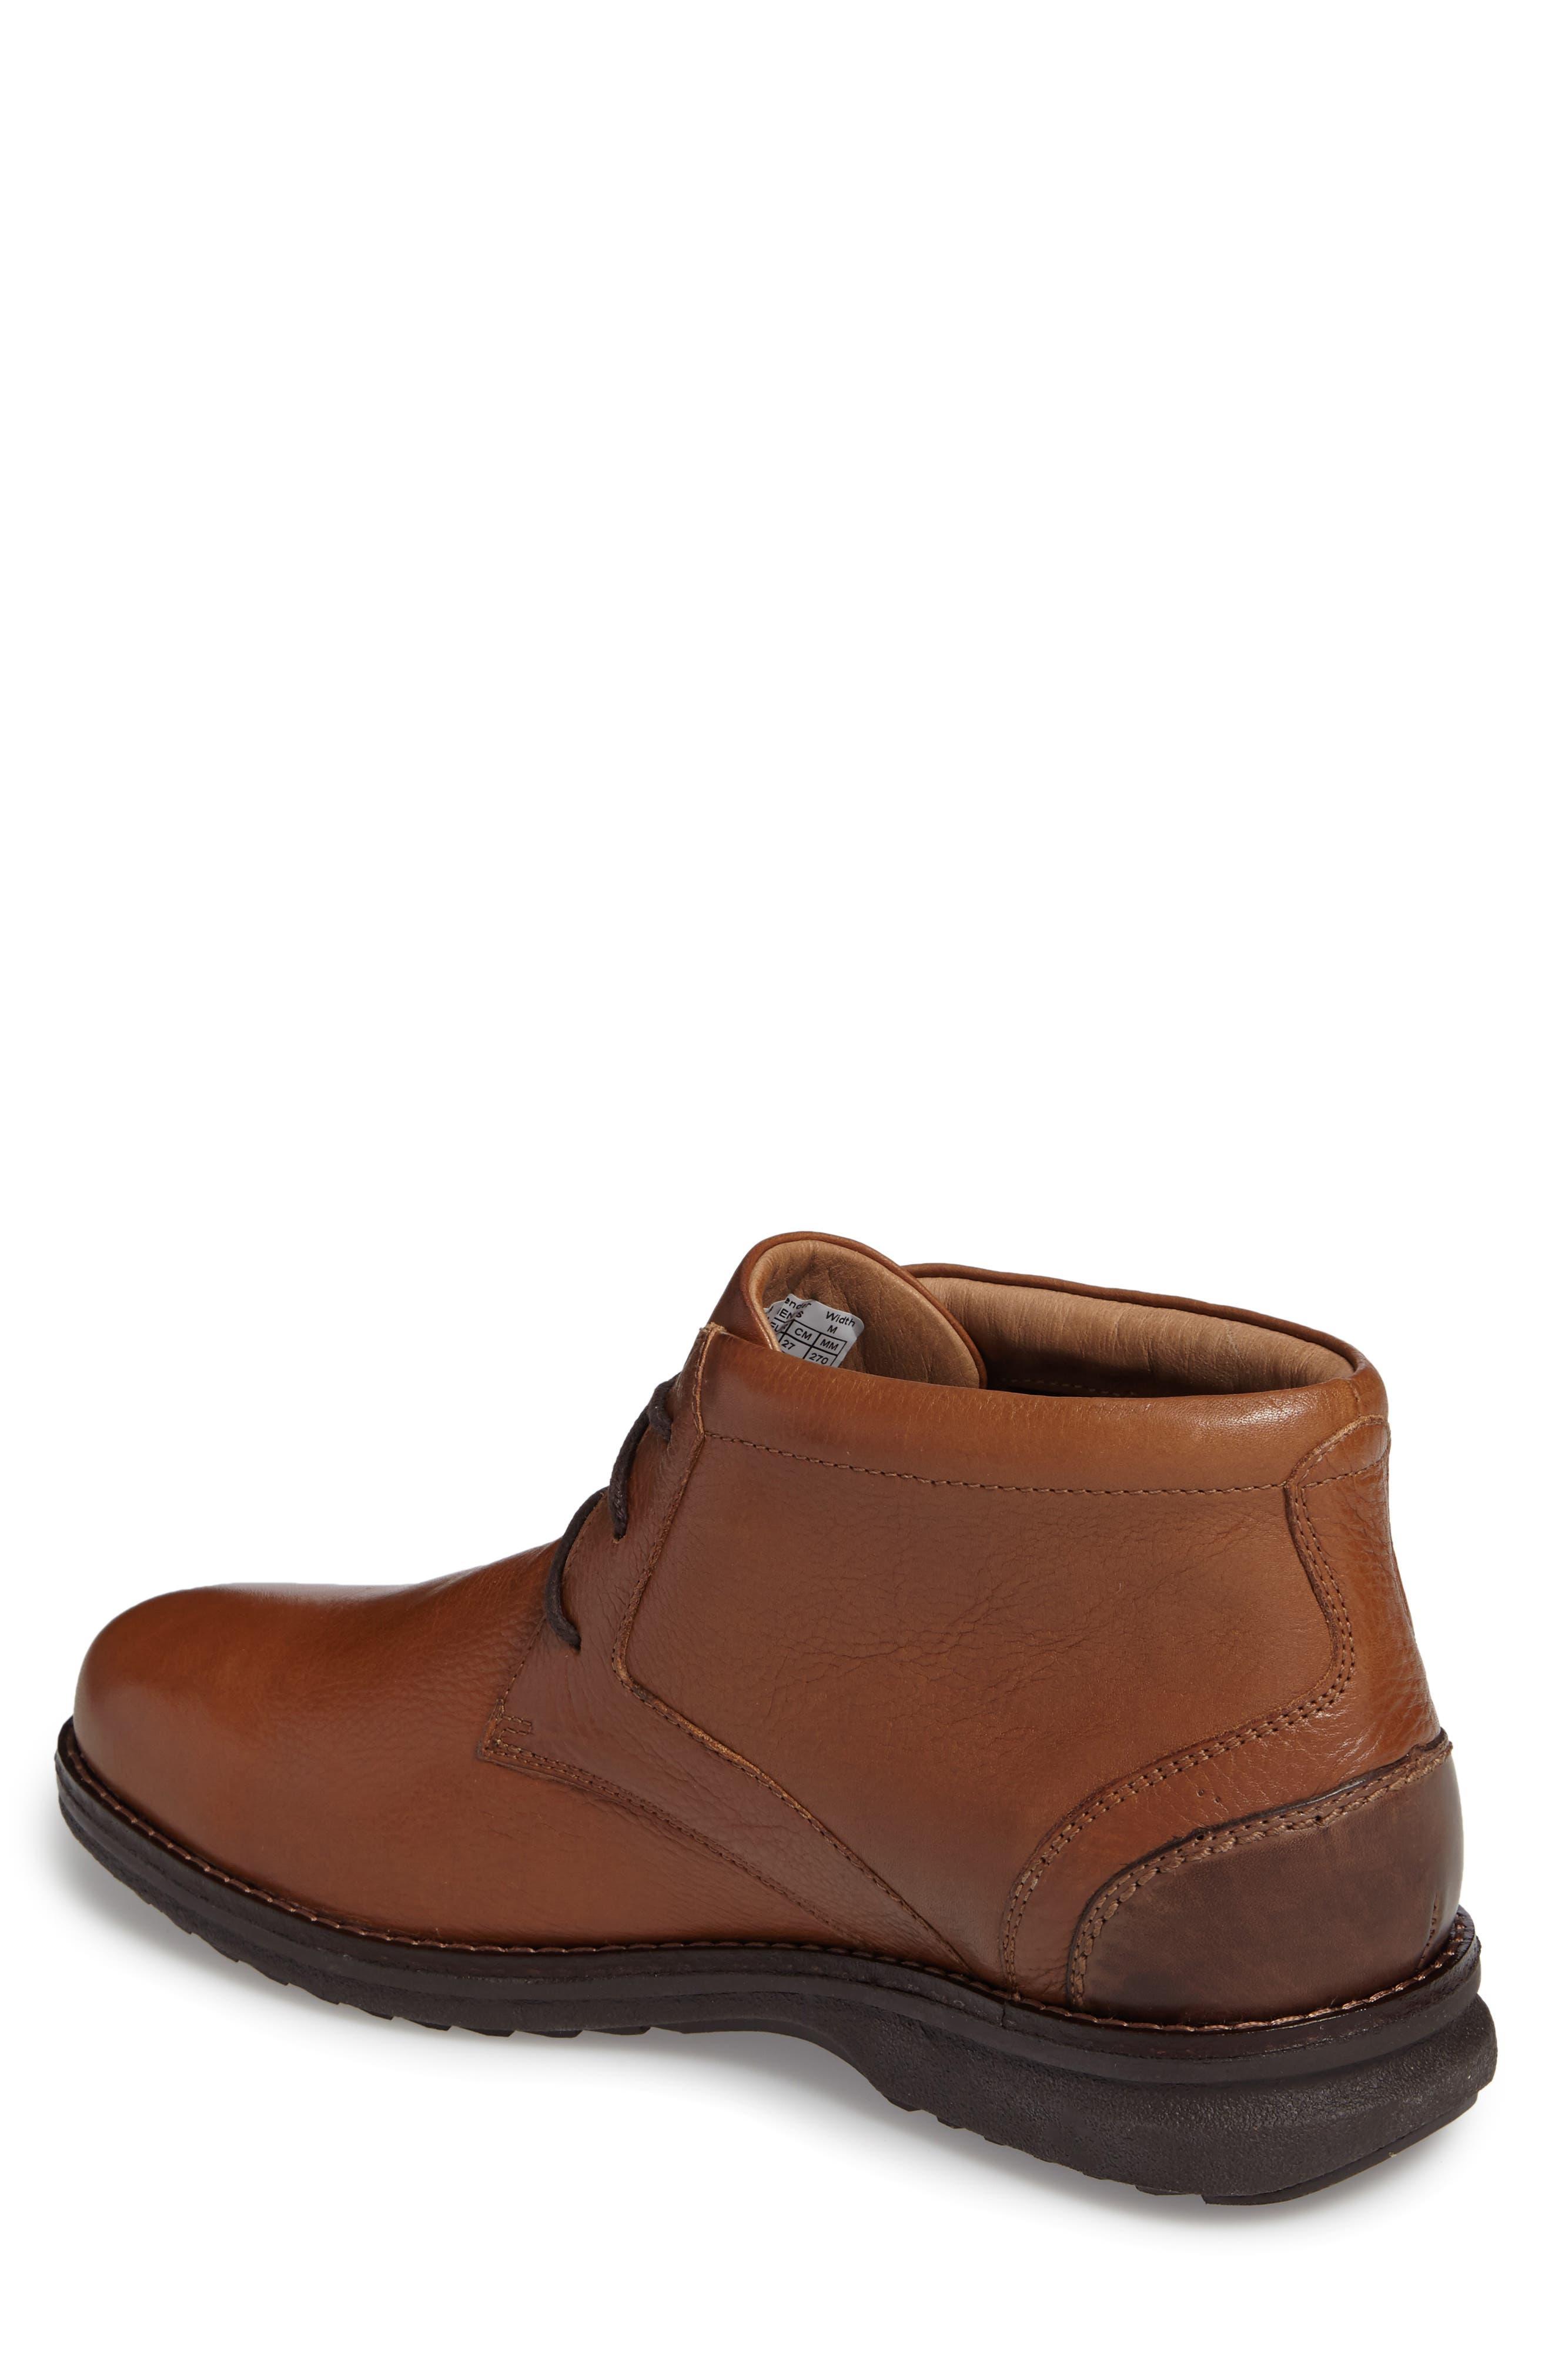 Premium Class Chukka Boot,                             Alternate thumbnail 4, color,